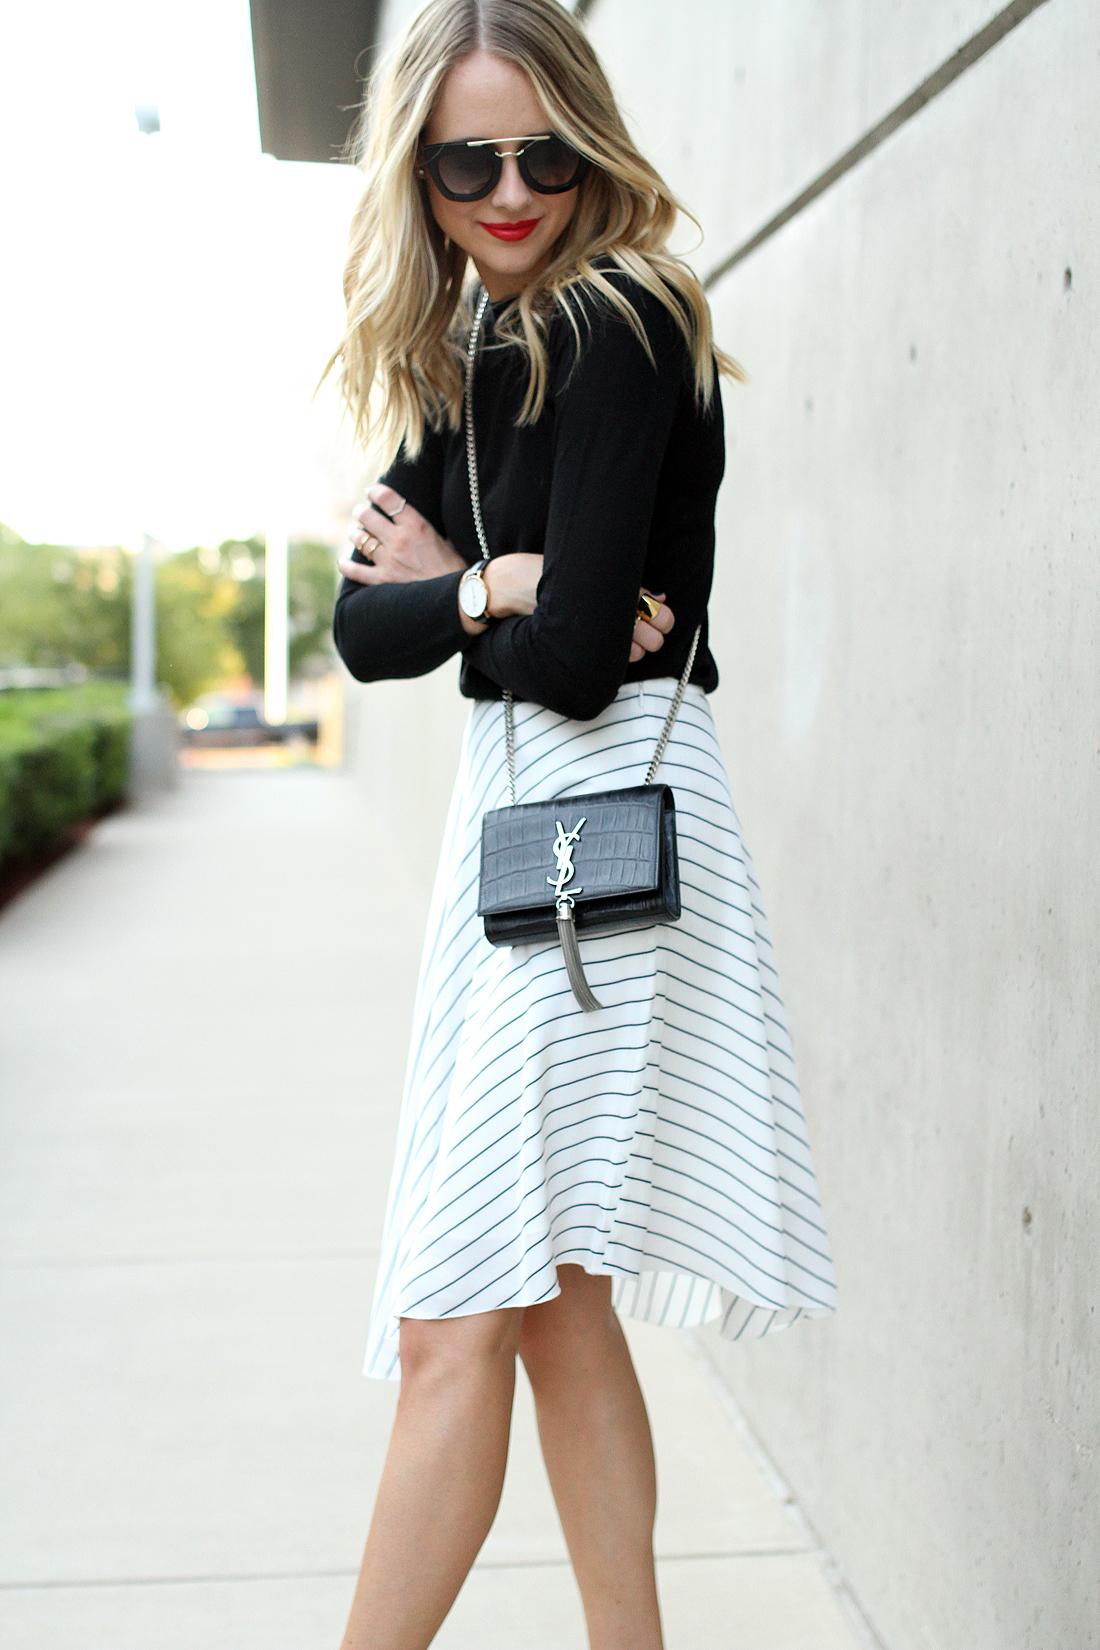 fashion-jackson-club-monaco-white-asymmetrical-skirt-black-sweater-prada-sunglasses-red-lipstick-saint-laurent-tassel-crossbody